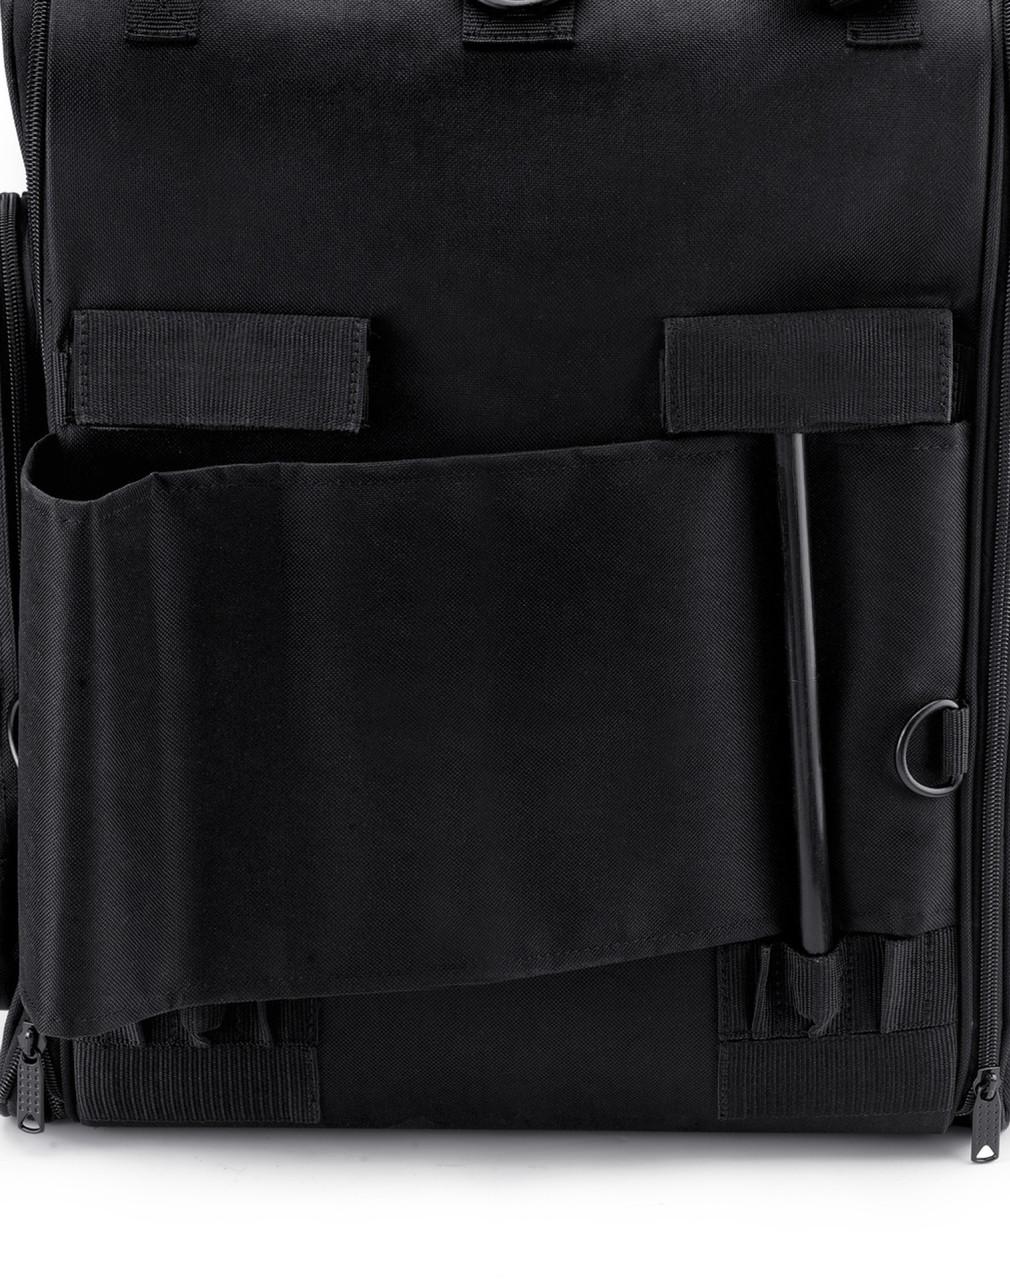 Harley Davidson Viking Extra Large Studded Motorcycle Tail Bag Back Side View